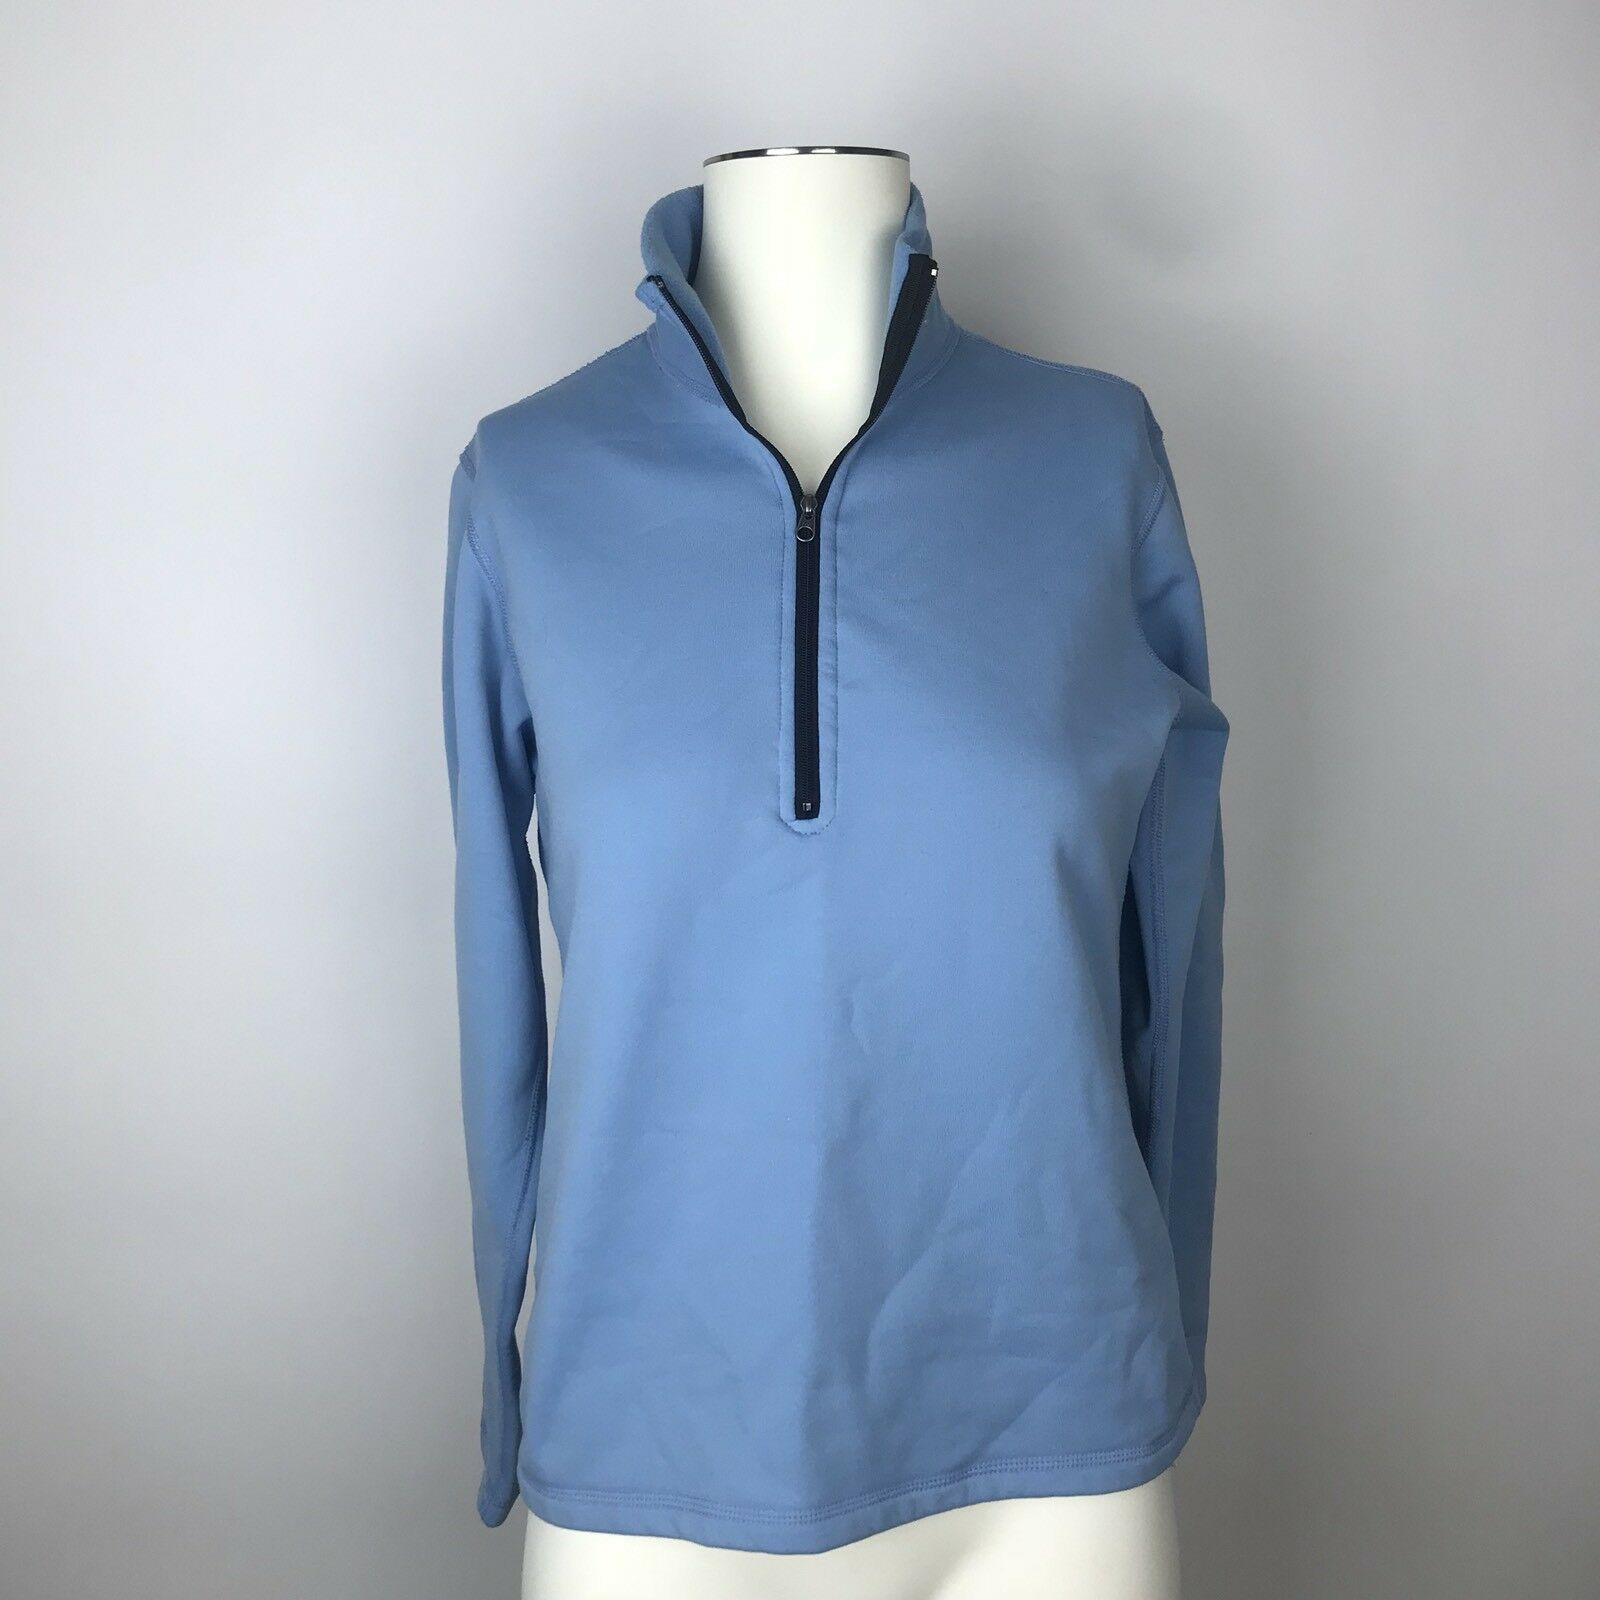 MOUNTAIN HARDWEAR Blue Half Zip Fleece Pullover Lightweight Jacket Top Small